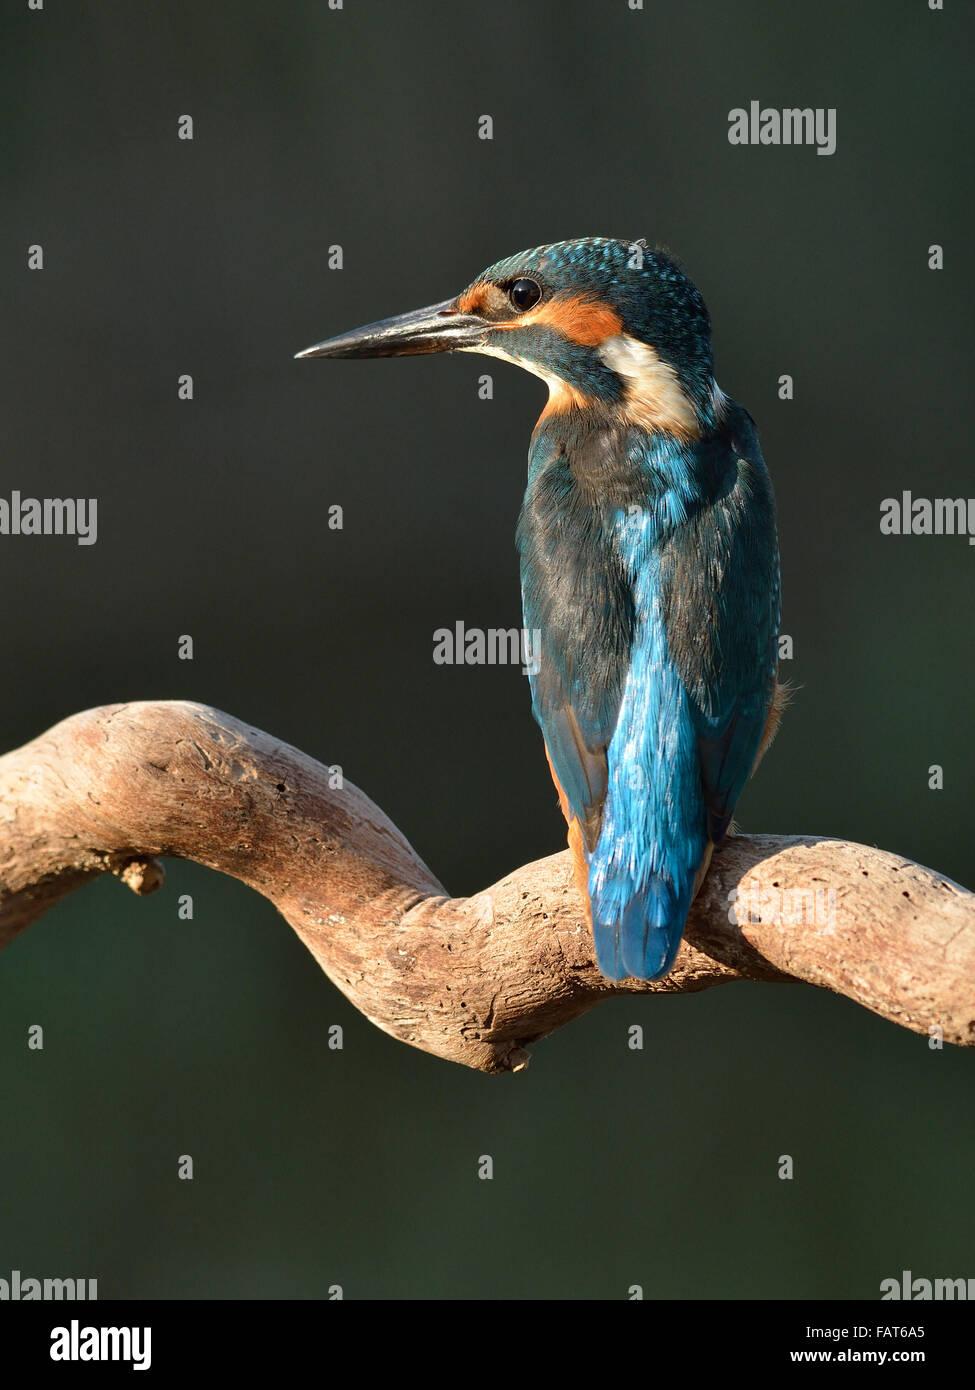 Eurasian Kingfisher on the branch - Stock Image